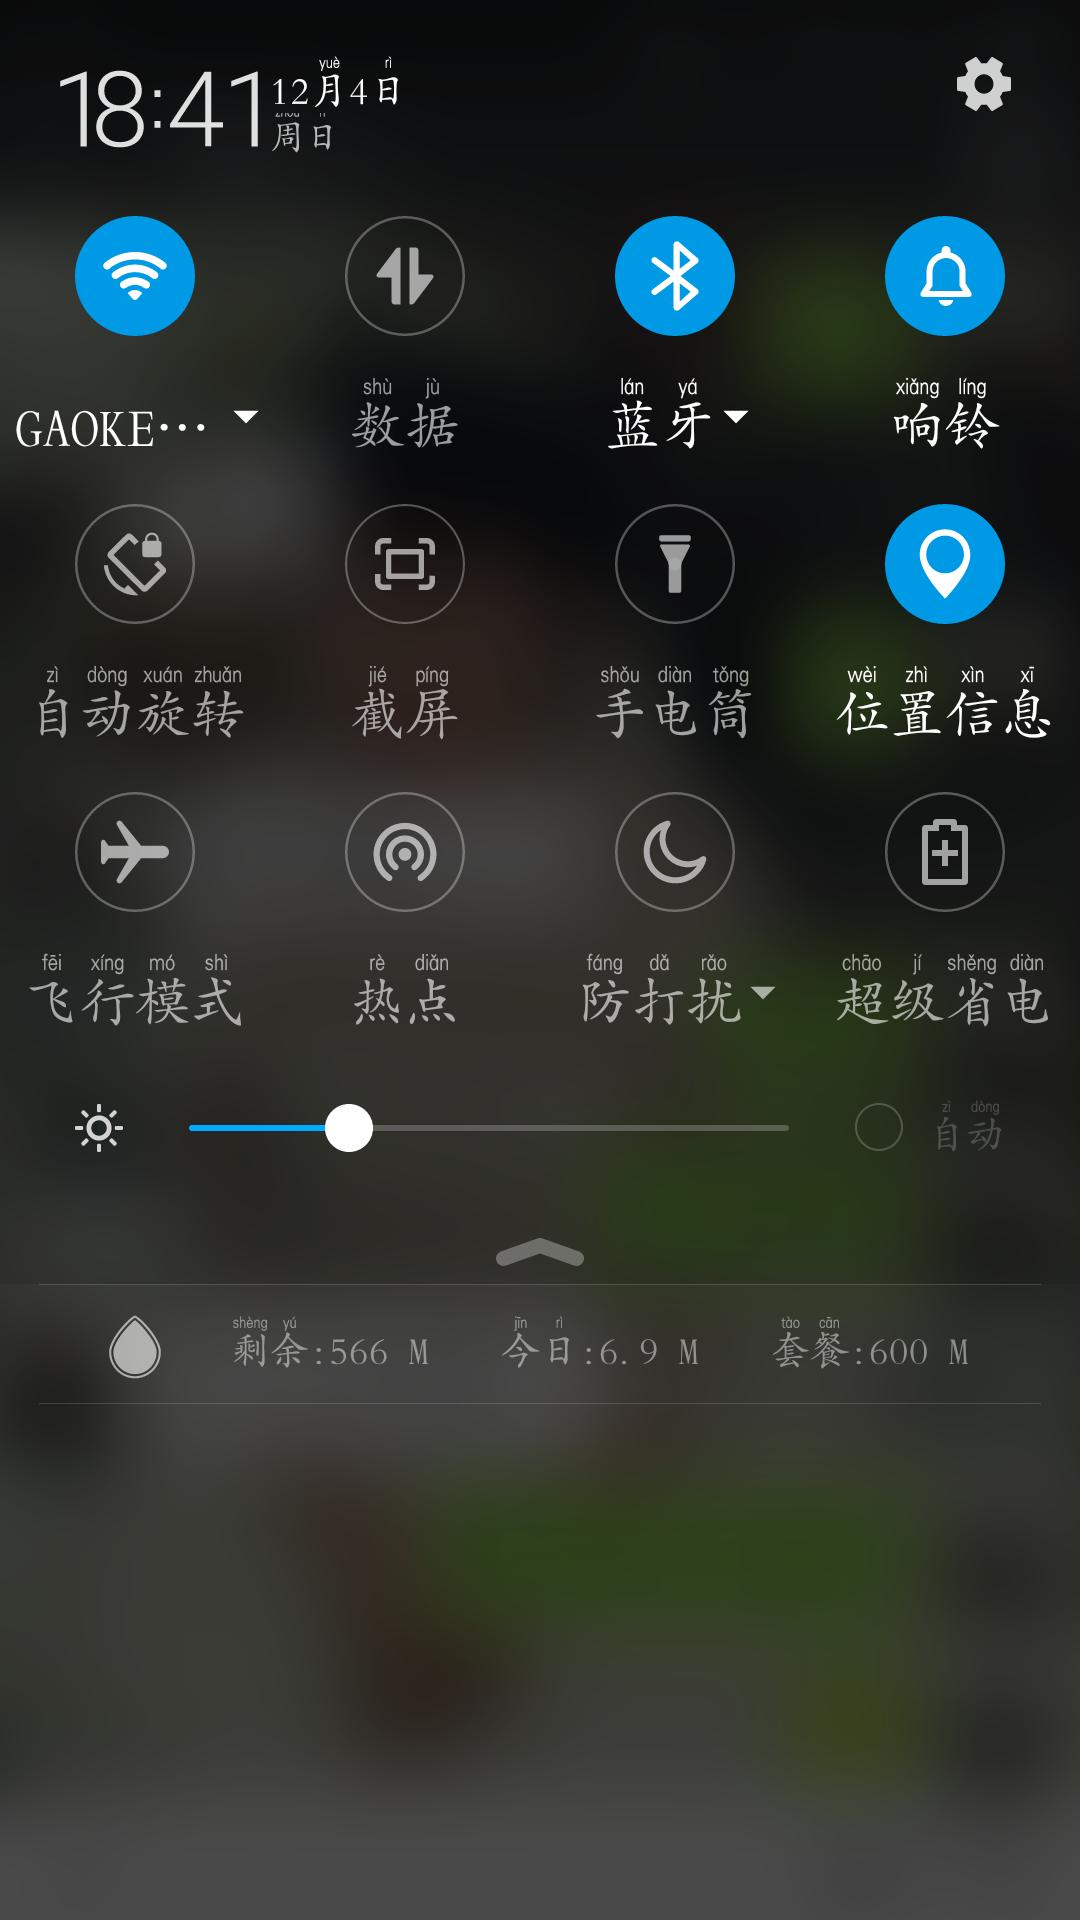 Screenshot_2016-12-04-18-41-47.png